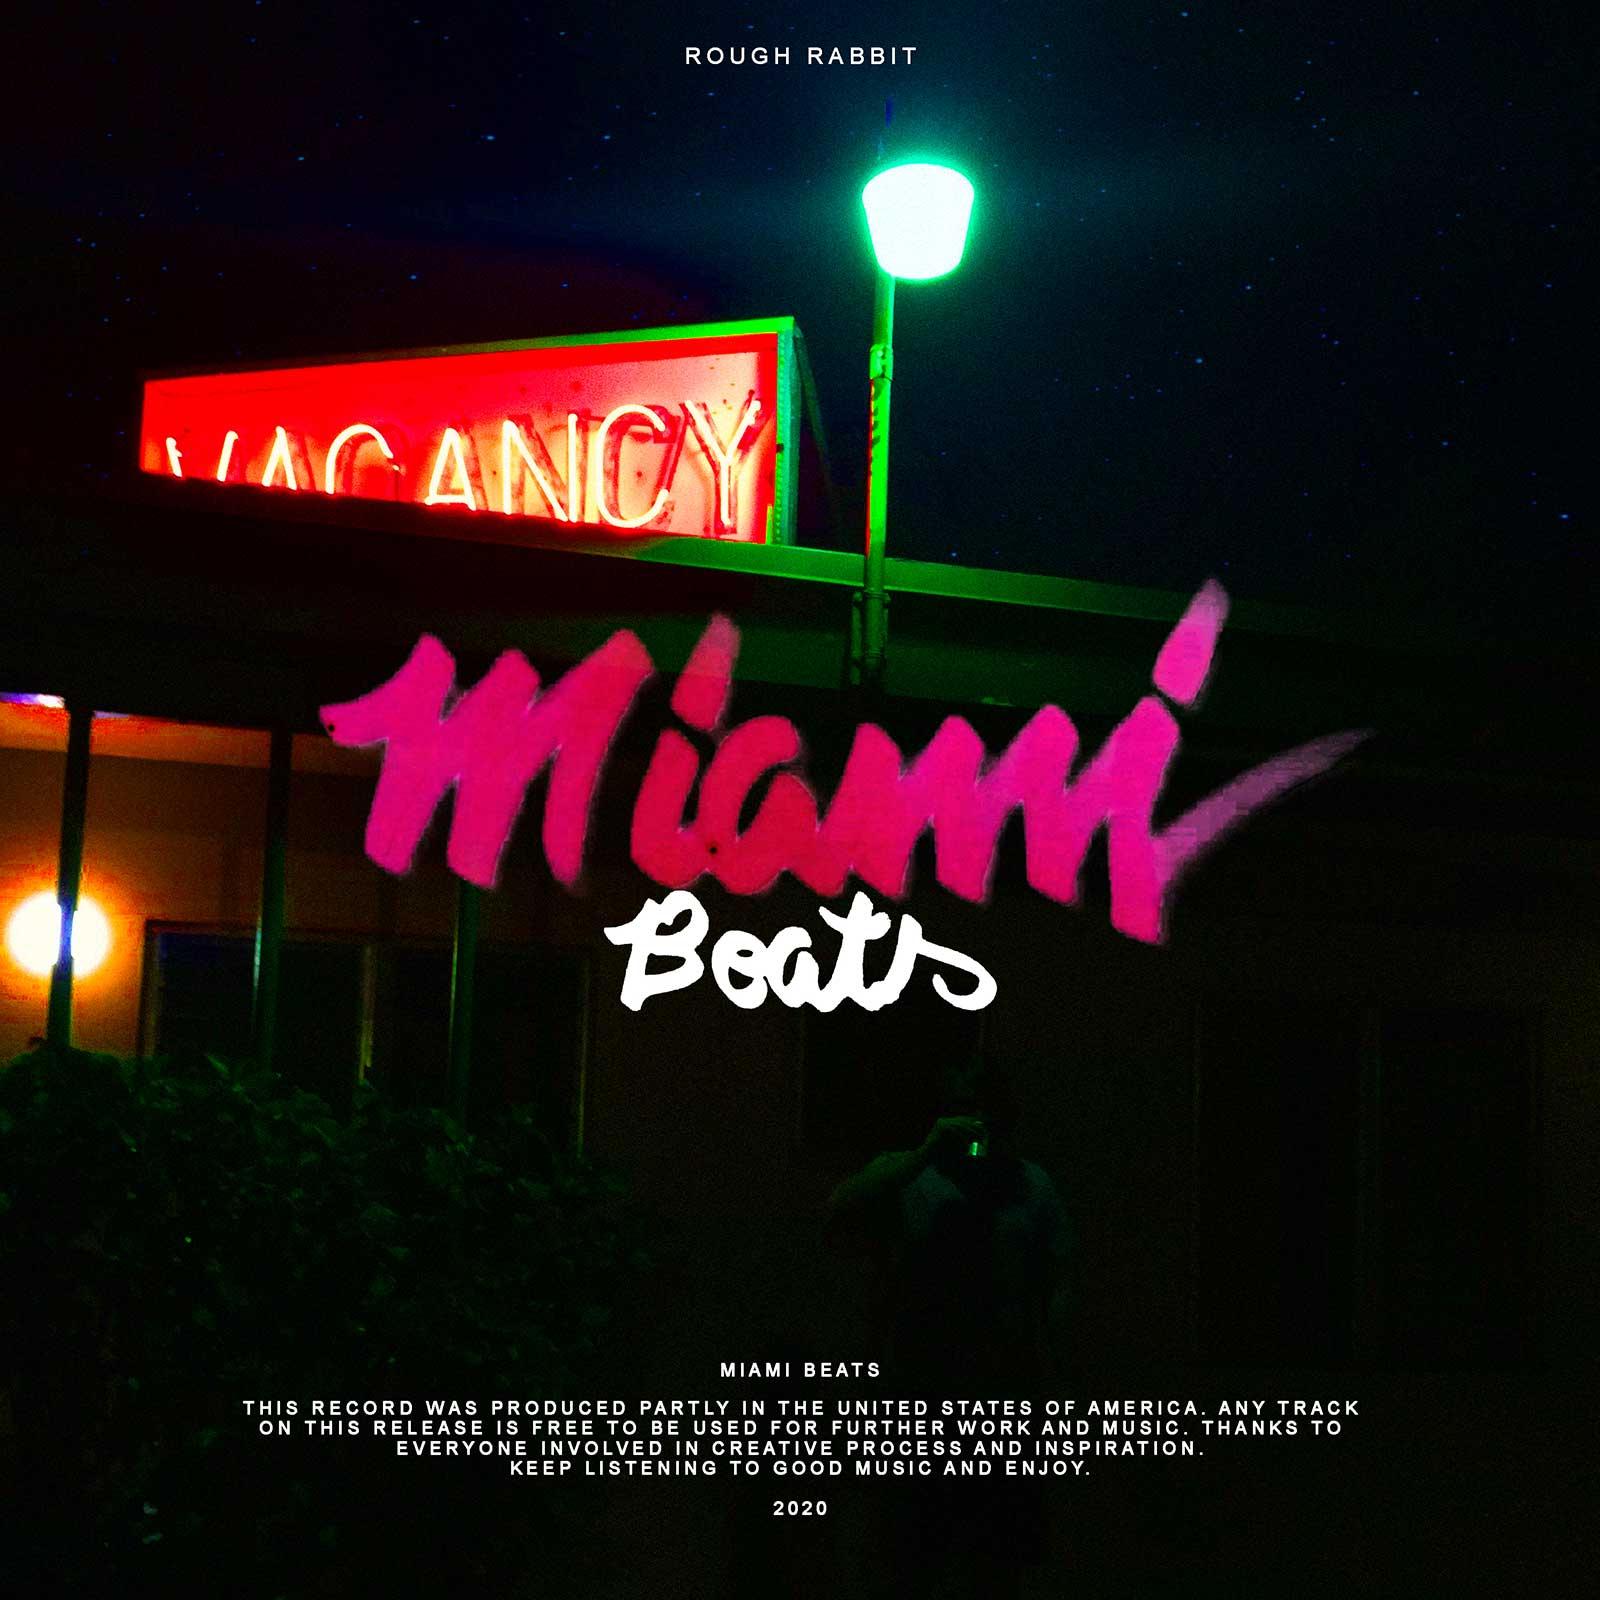 Upcoming: Rough Rabbit - Miami Beats